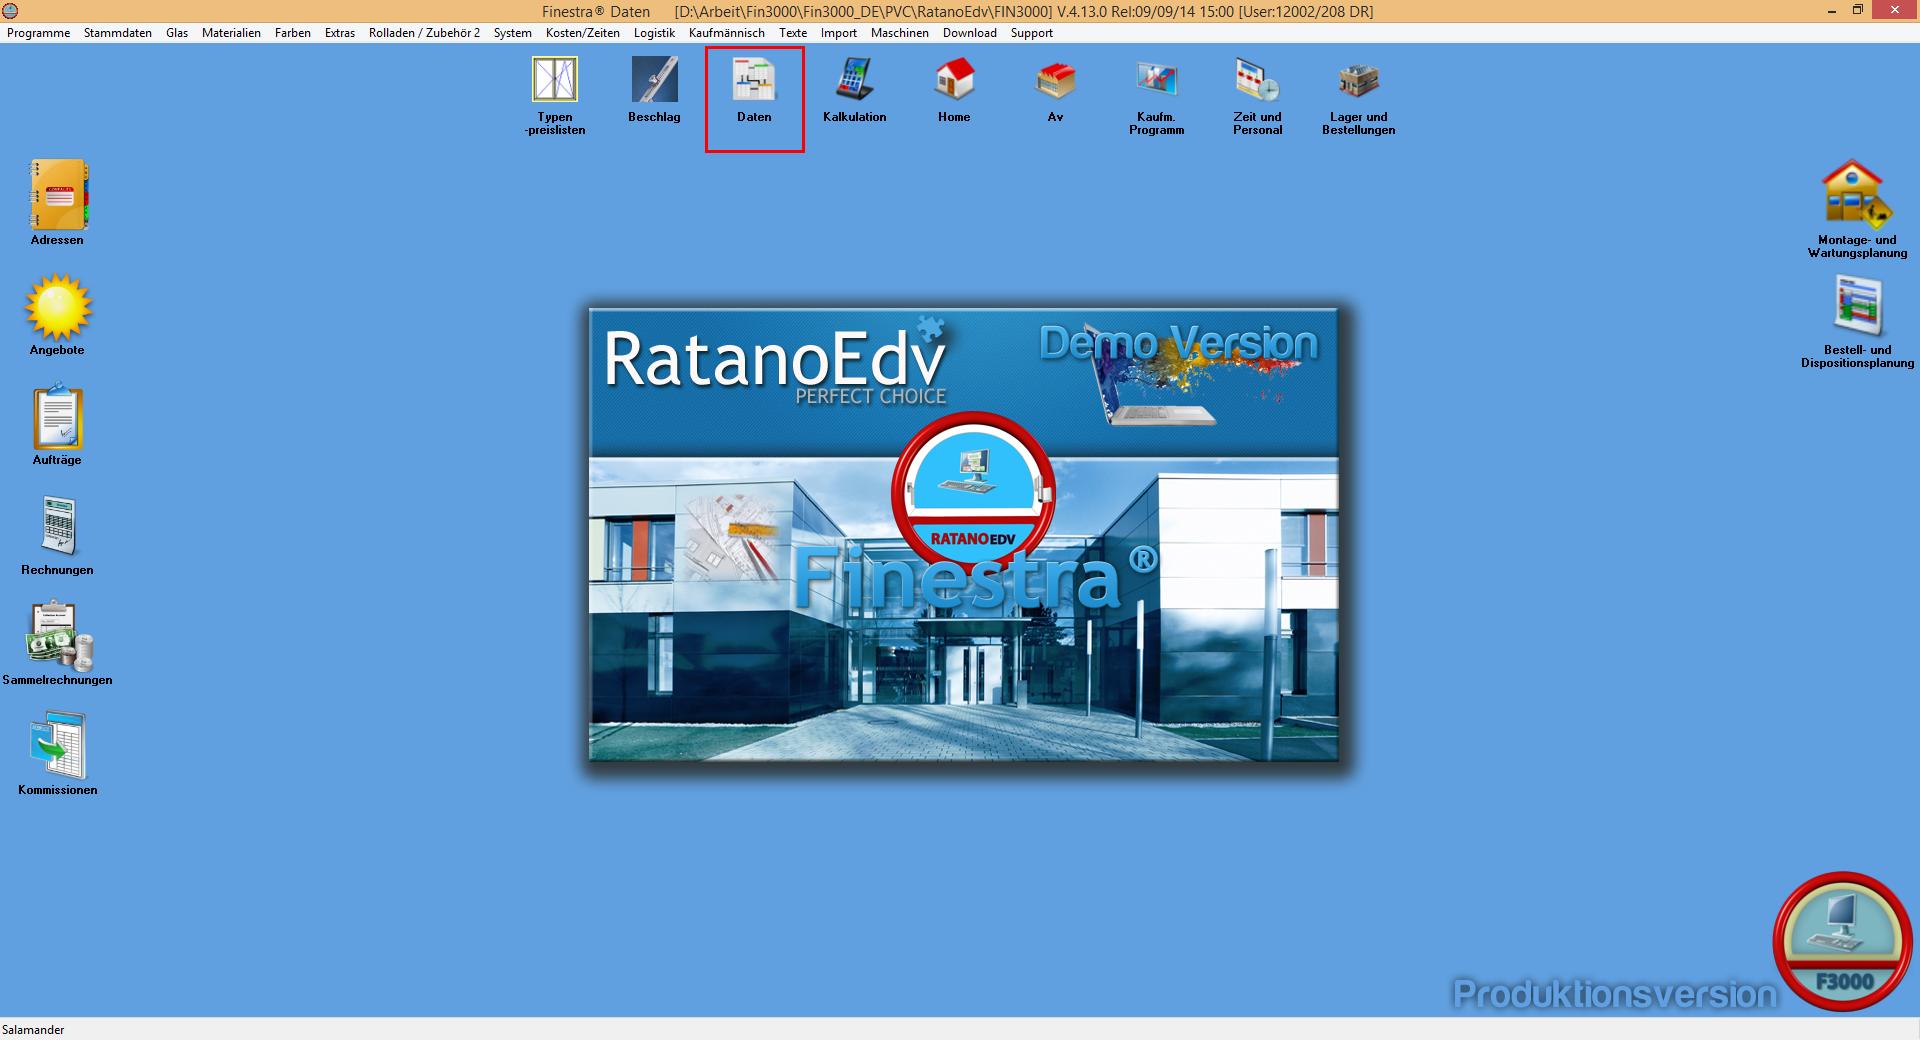 1 RatanoEdv